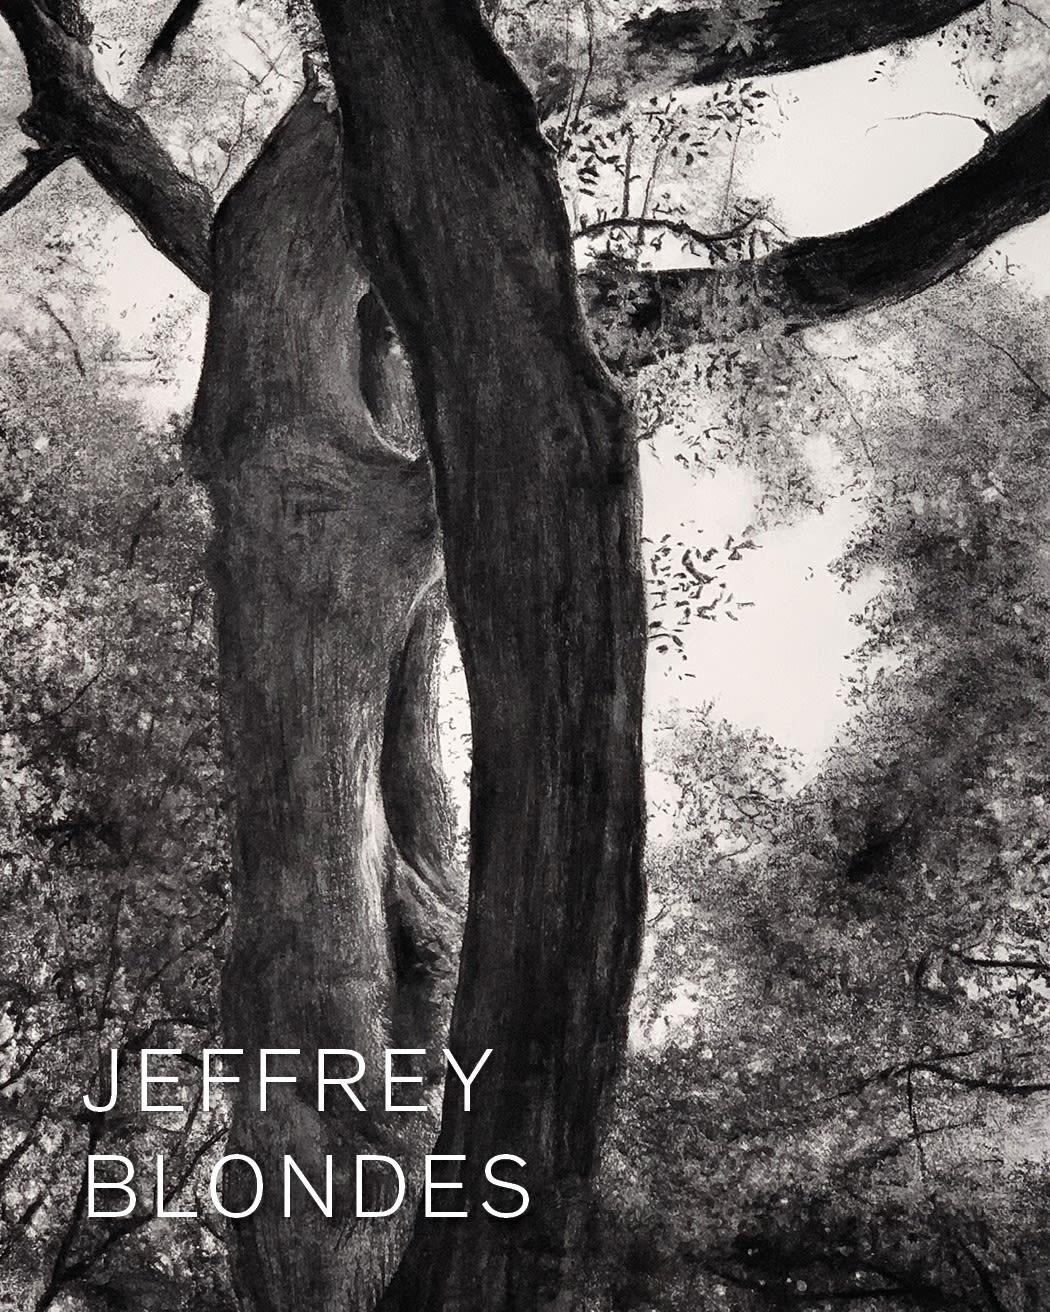 Jeffery Blondes